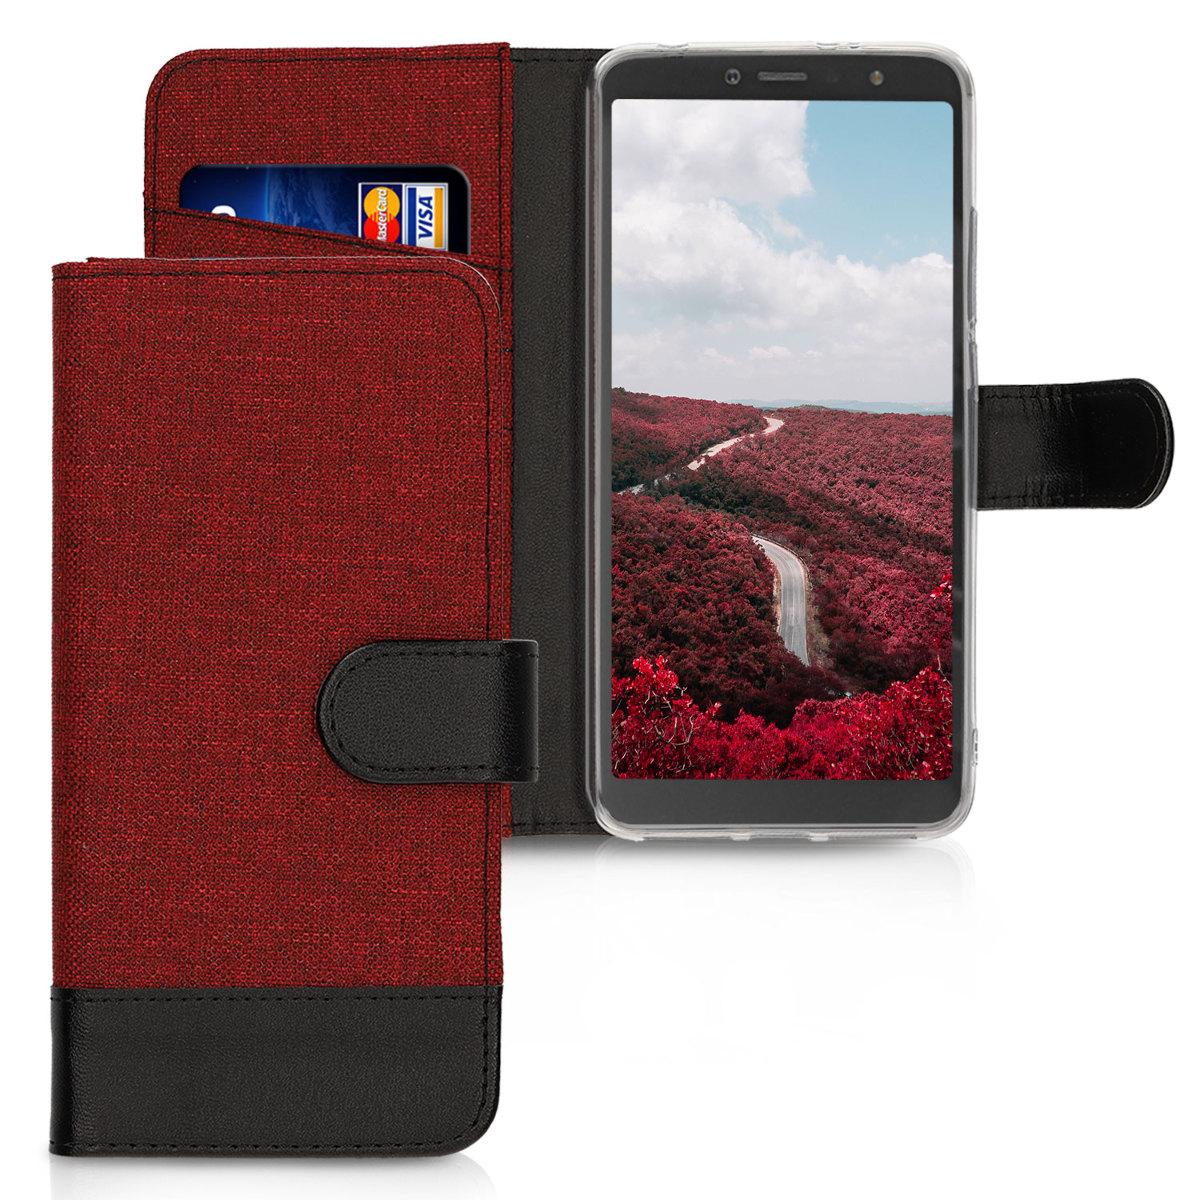 KW Θήκη-Πορτοφόλι Xiaomi Redmi S2 - Dark Red / Black Canvas (45871.20)